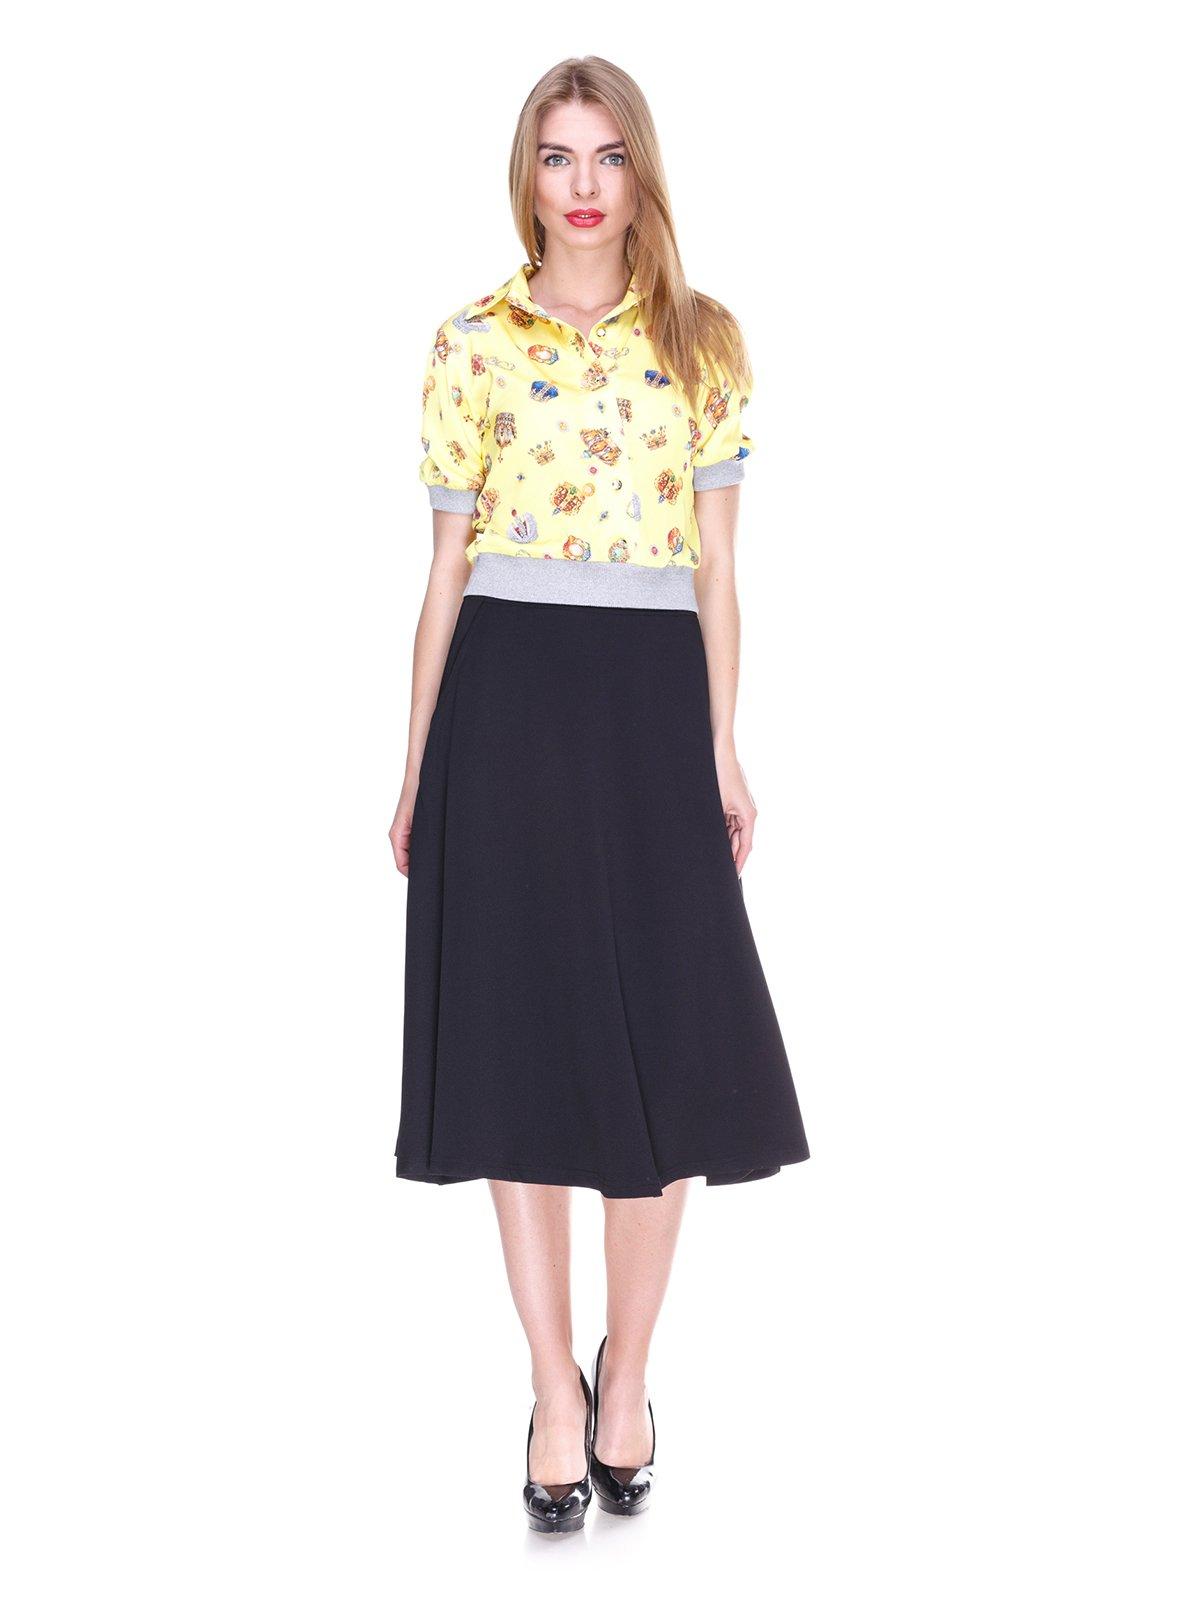 Блуза жовта з принтом | 2273964 | фото 4